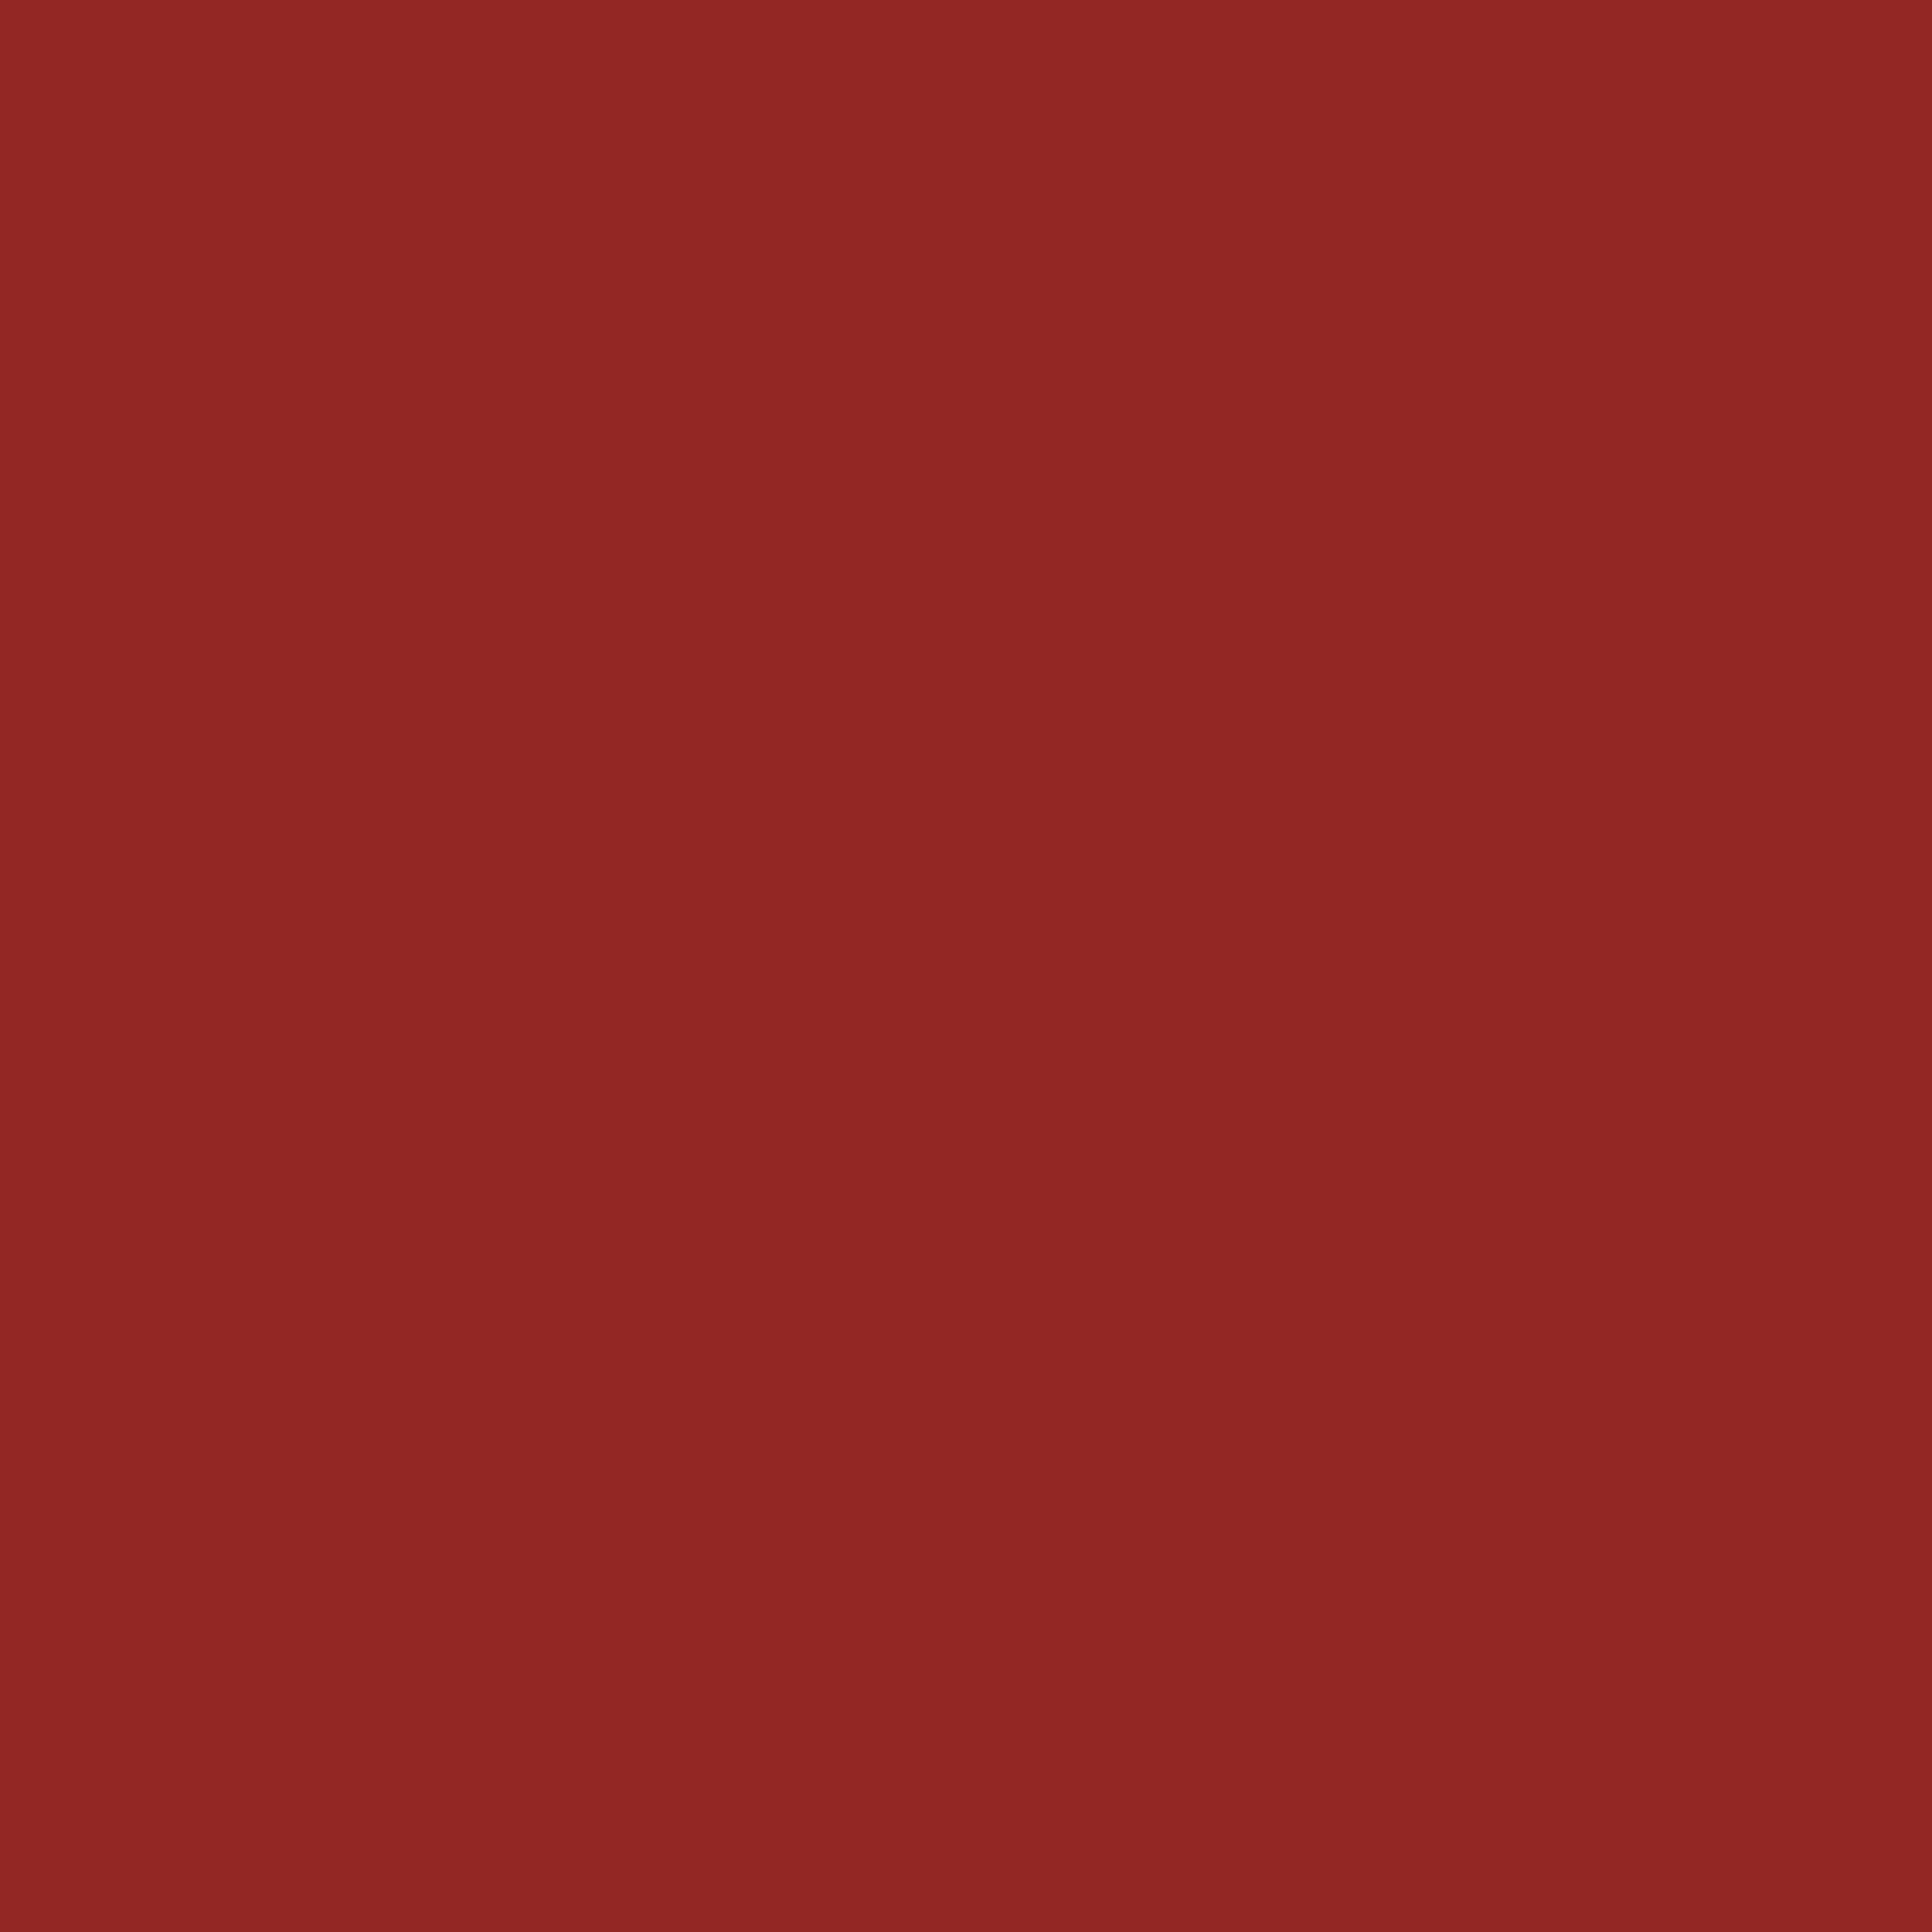 2048x2048 Vivid Auburn Solid Color Background